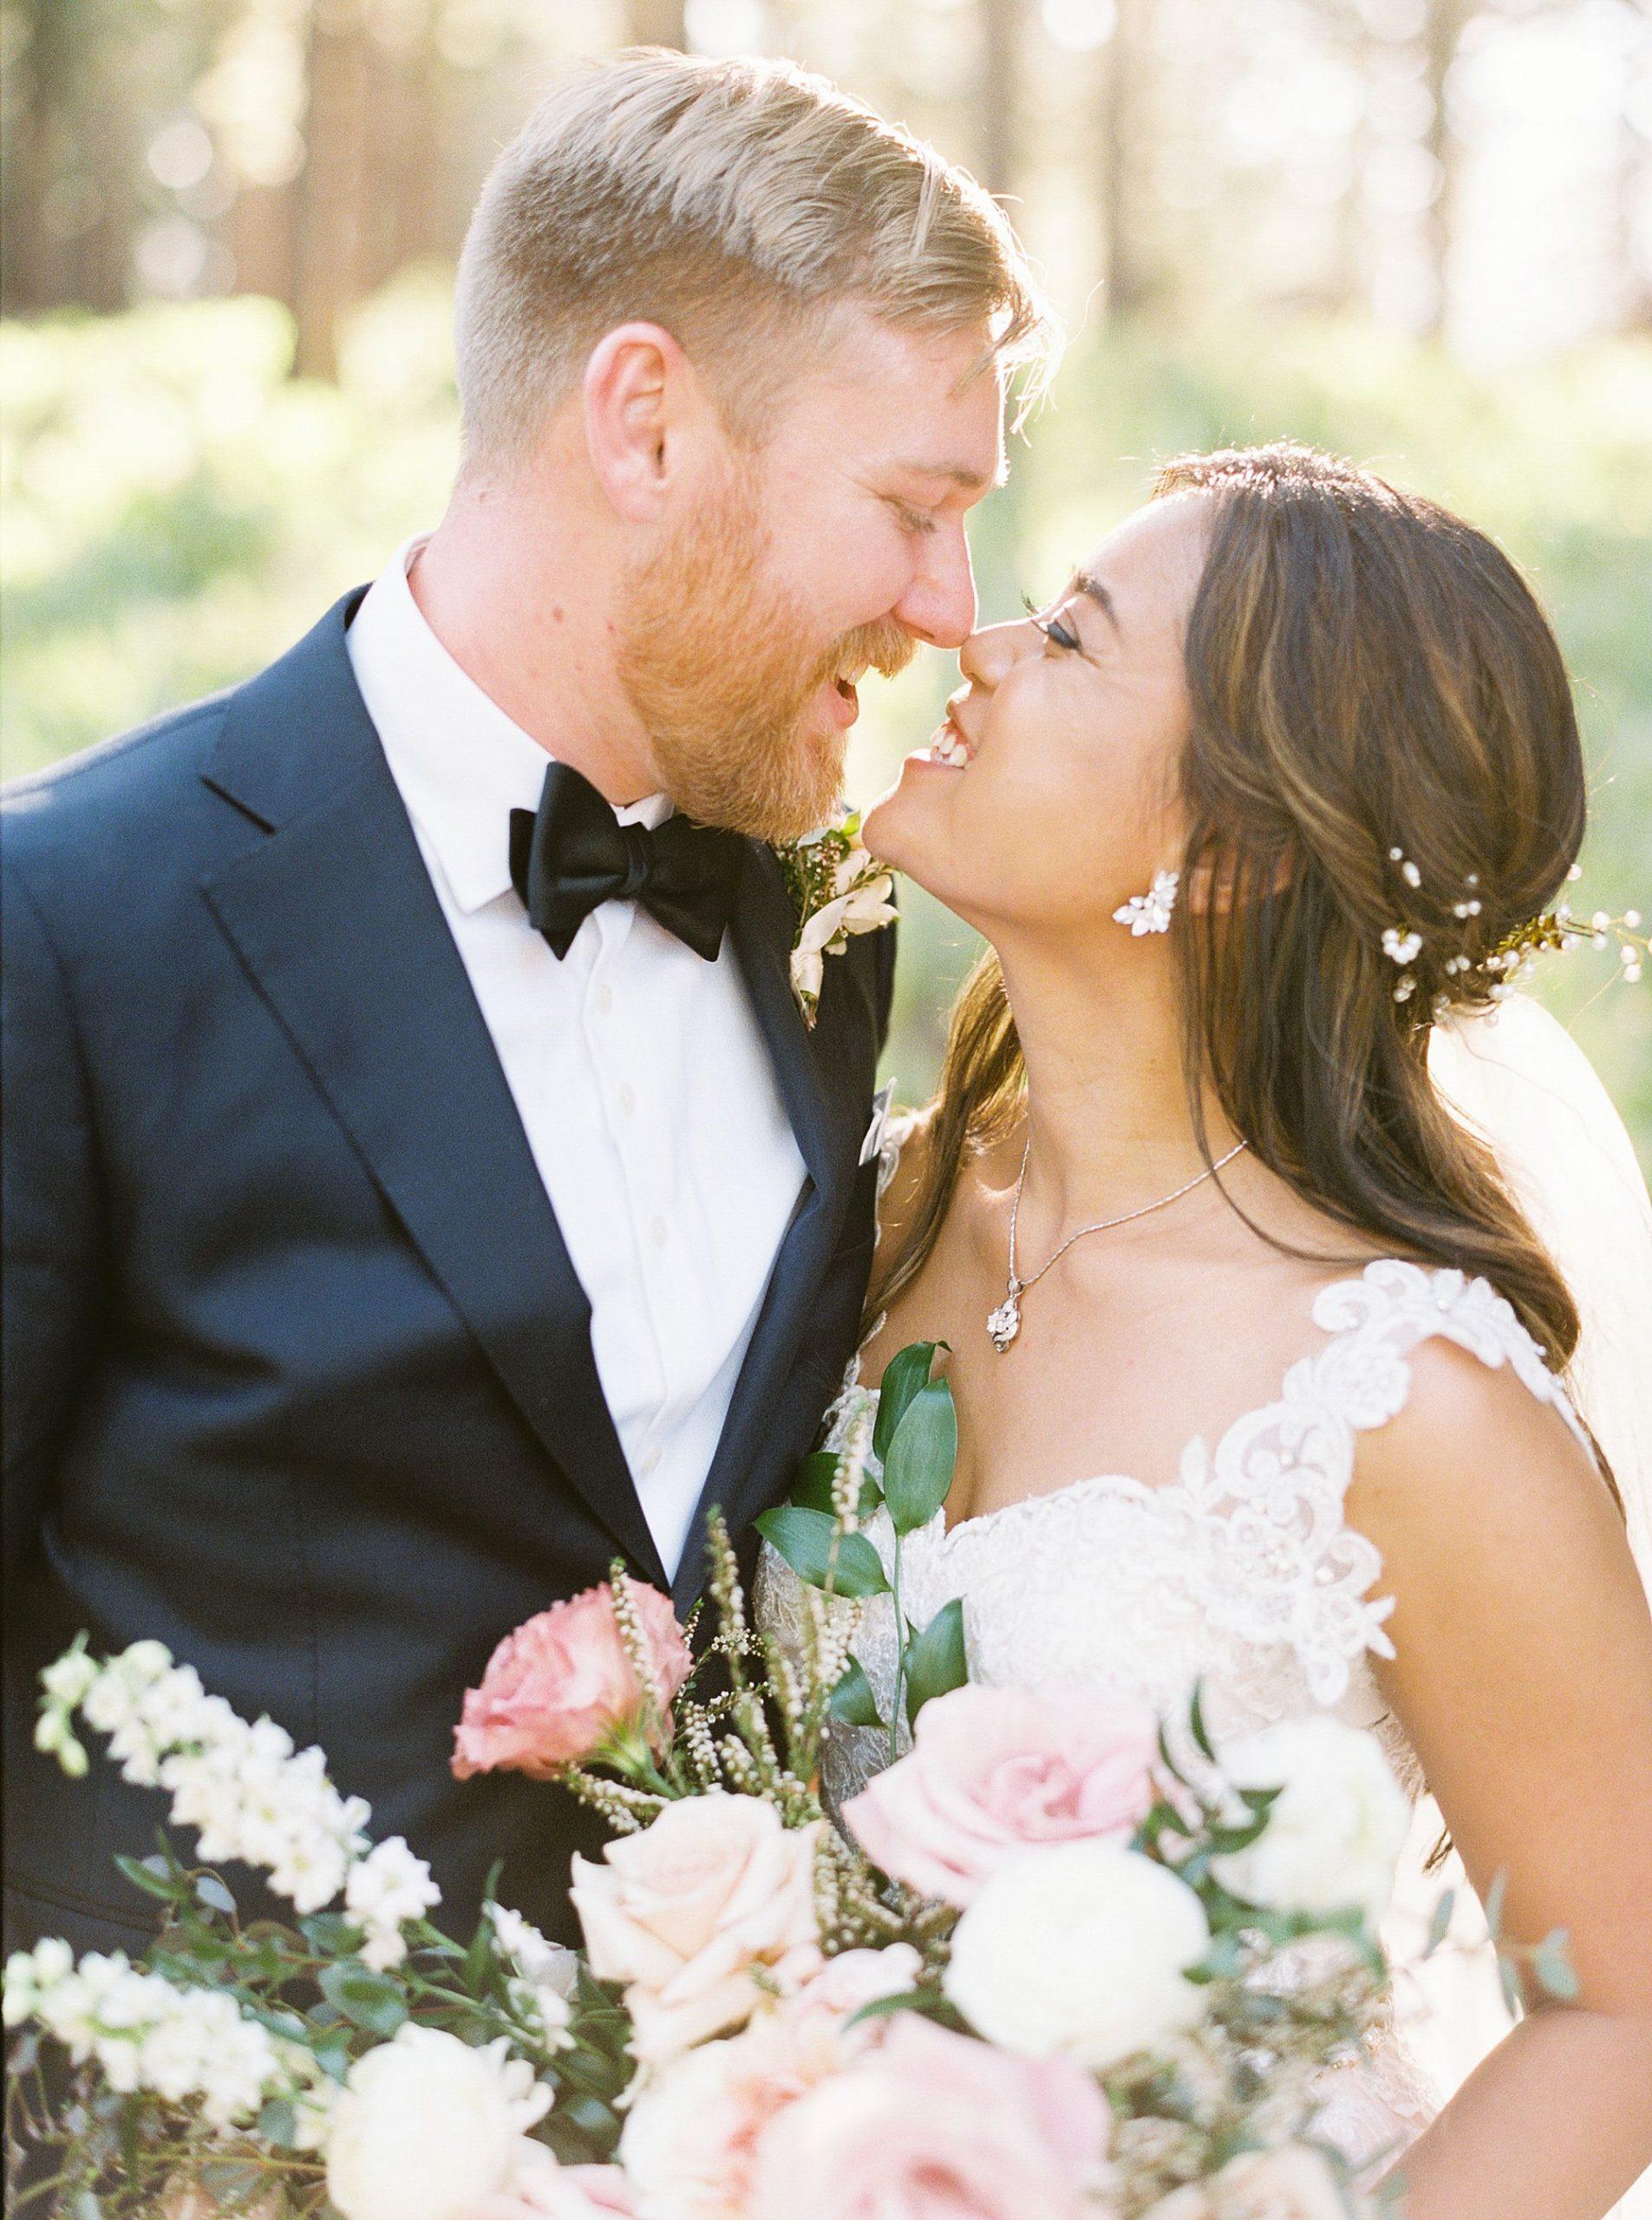 MITCHELLS MOUNTAIN MEADOWS Wedding - Ash Baumgartner - Phallina and Matt - Sierraville Wedding - Tahoe Wedding Photography_0011.jpg